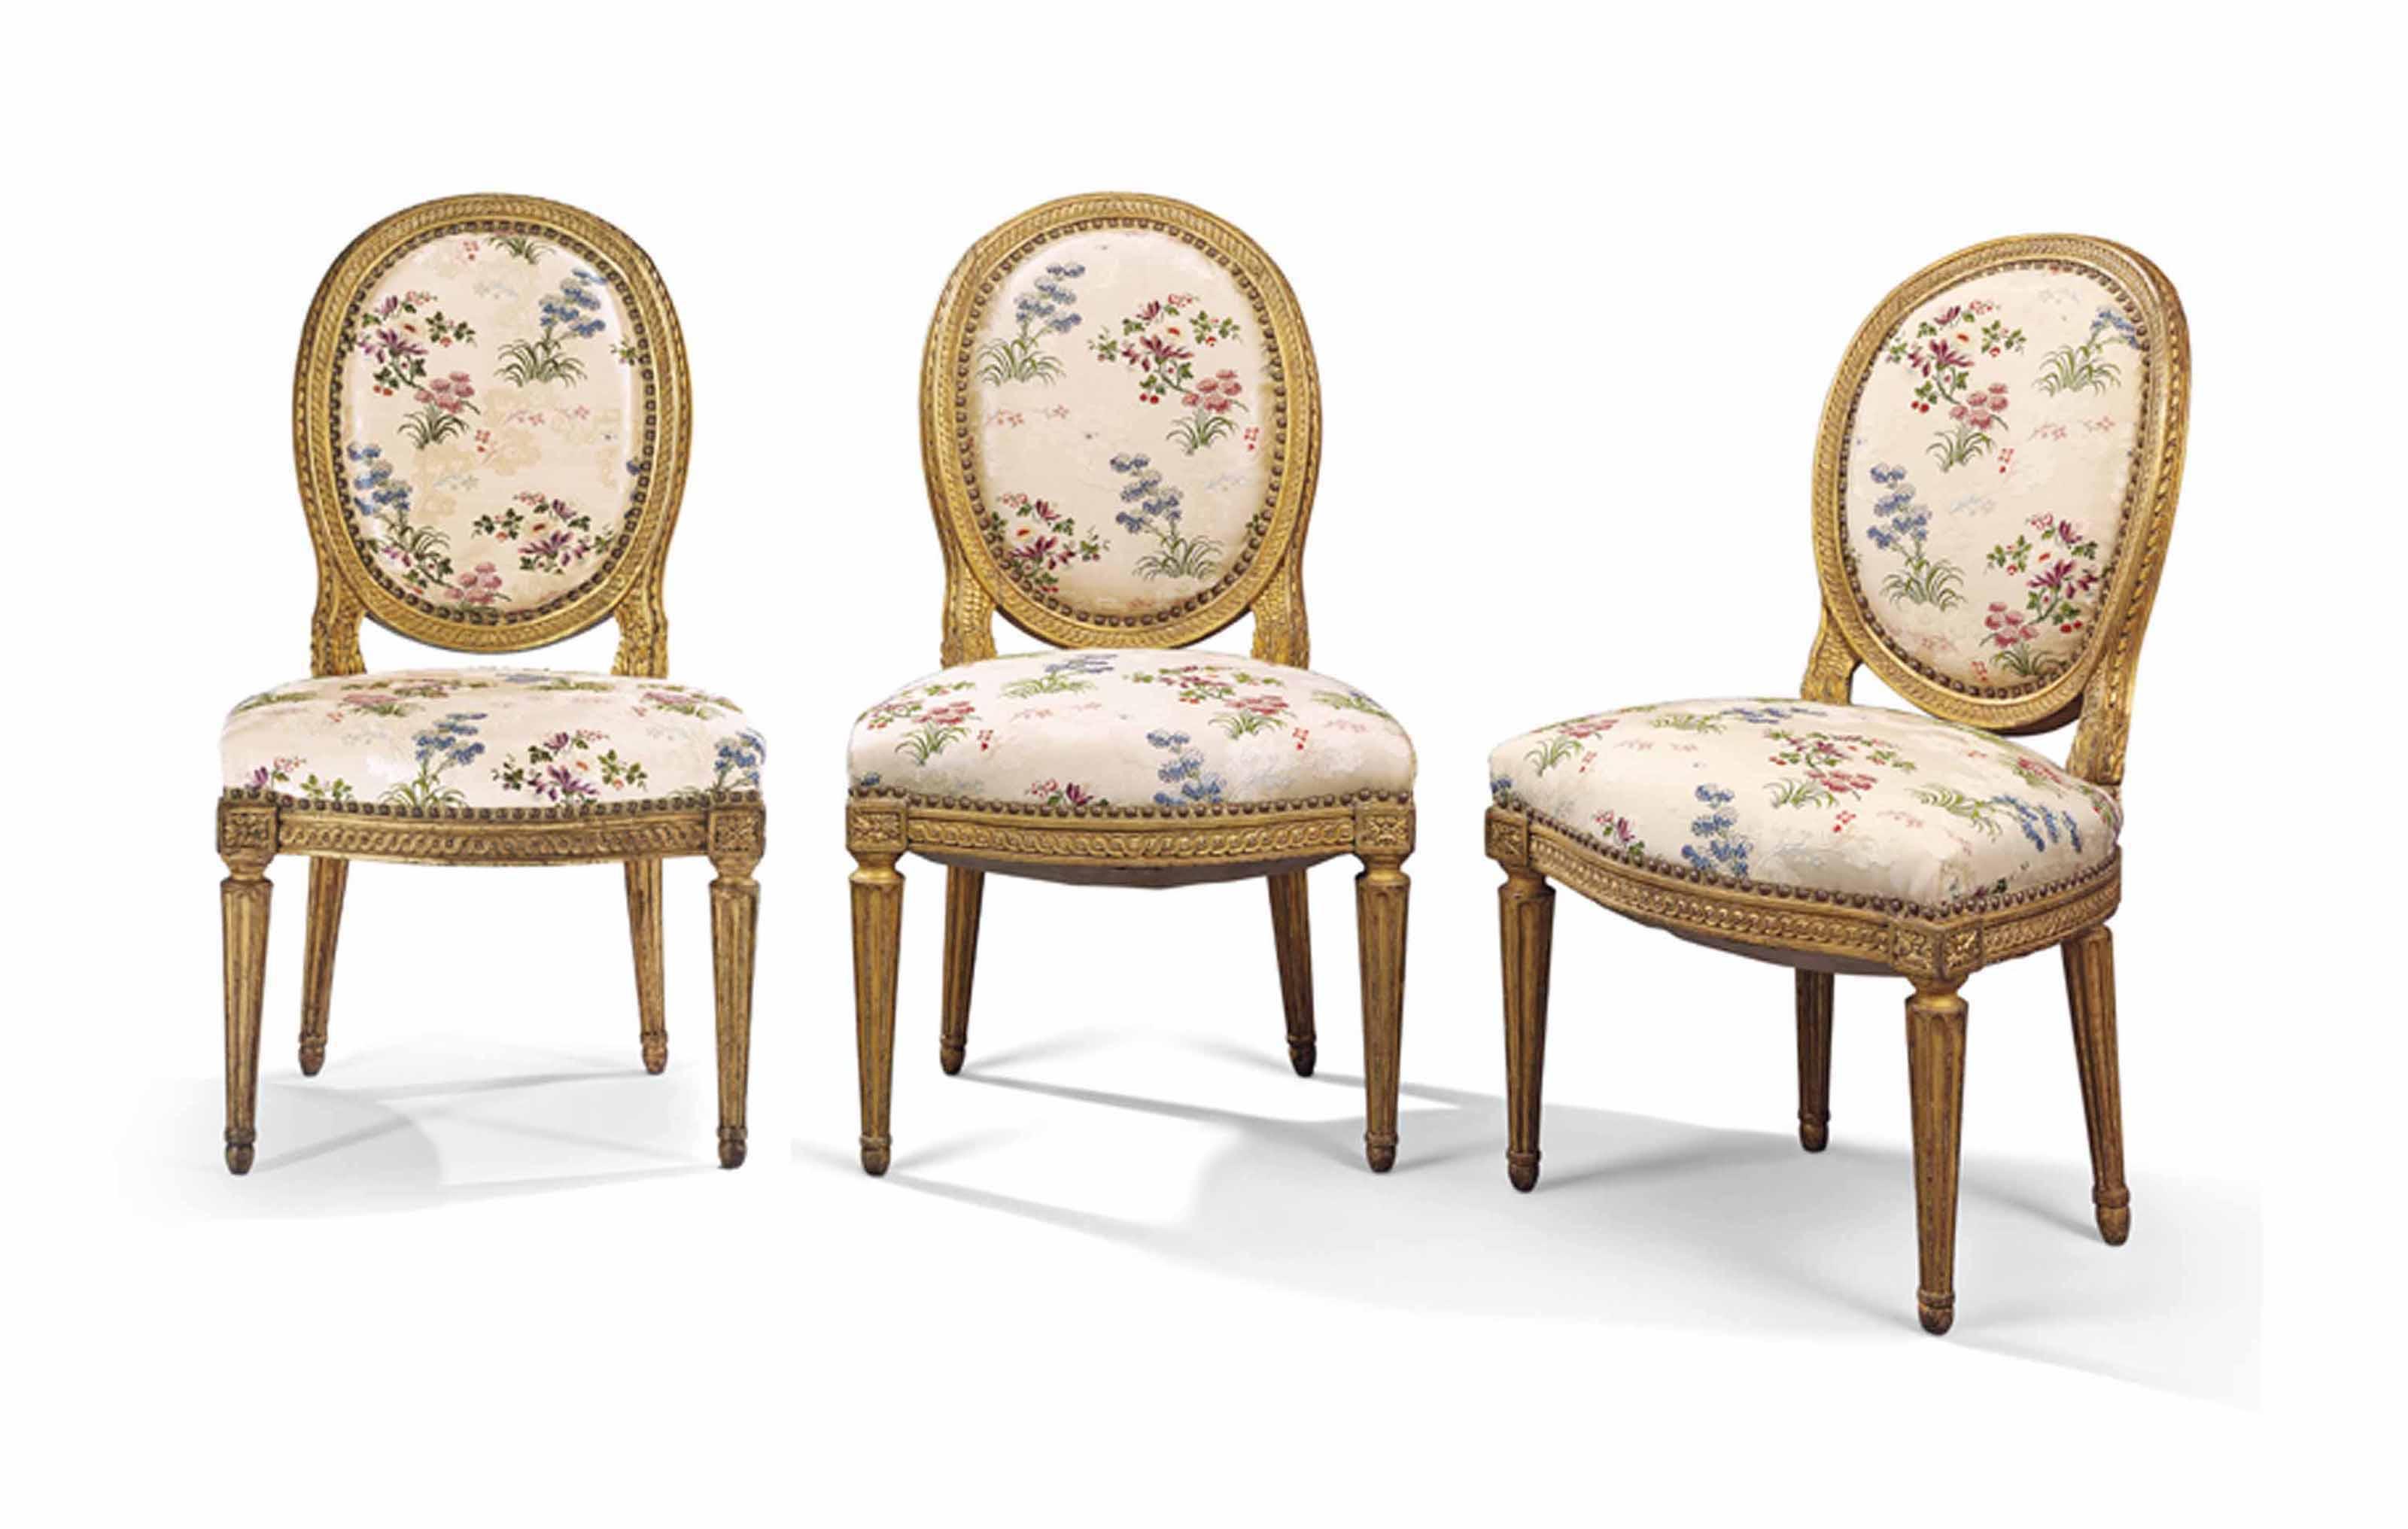 A SET OF THREE LOUIS XVI GILTWOOD CHAIRS